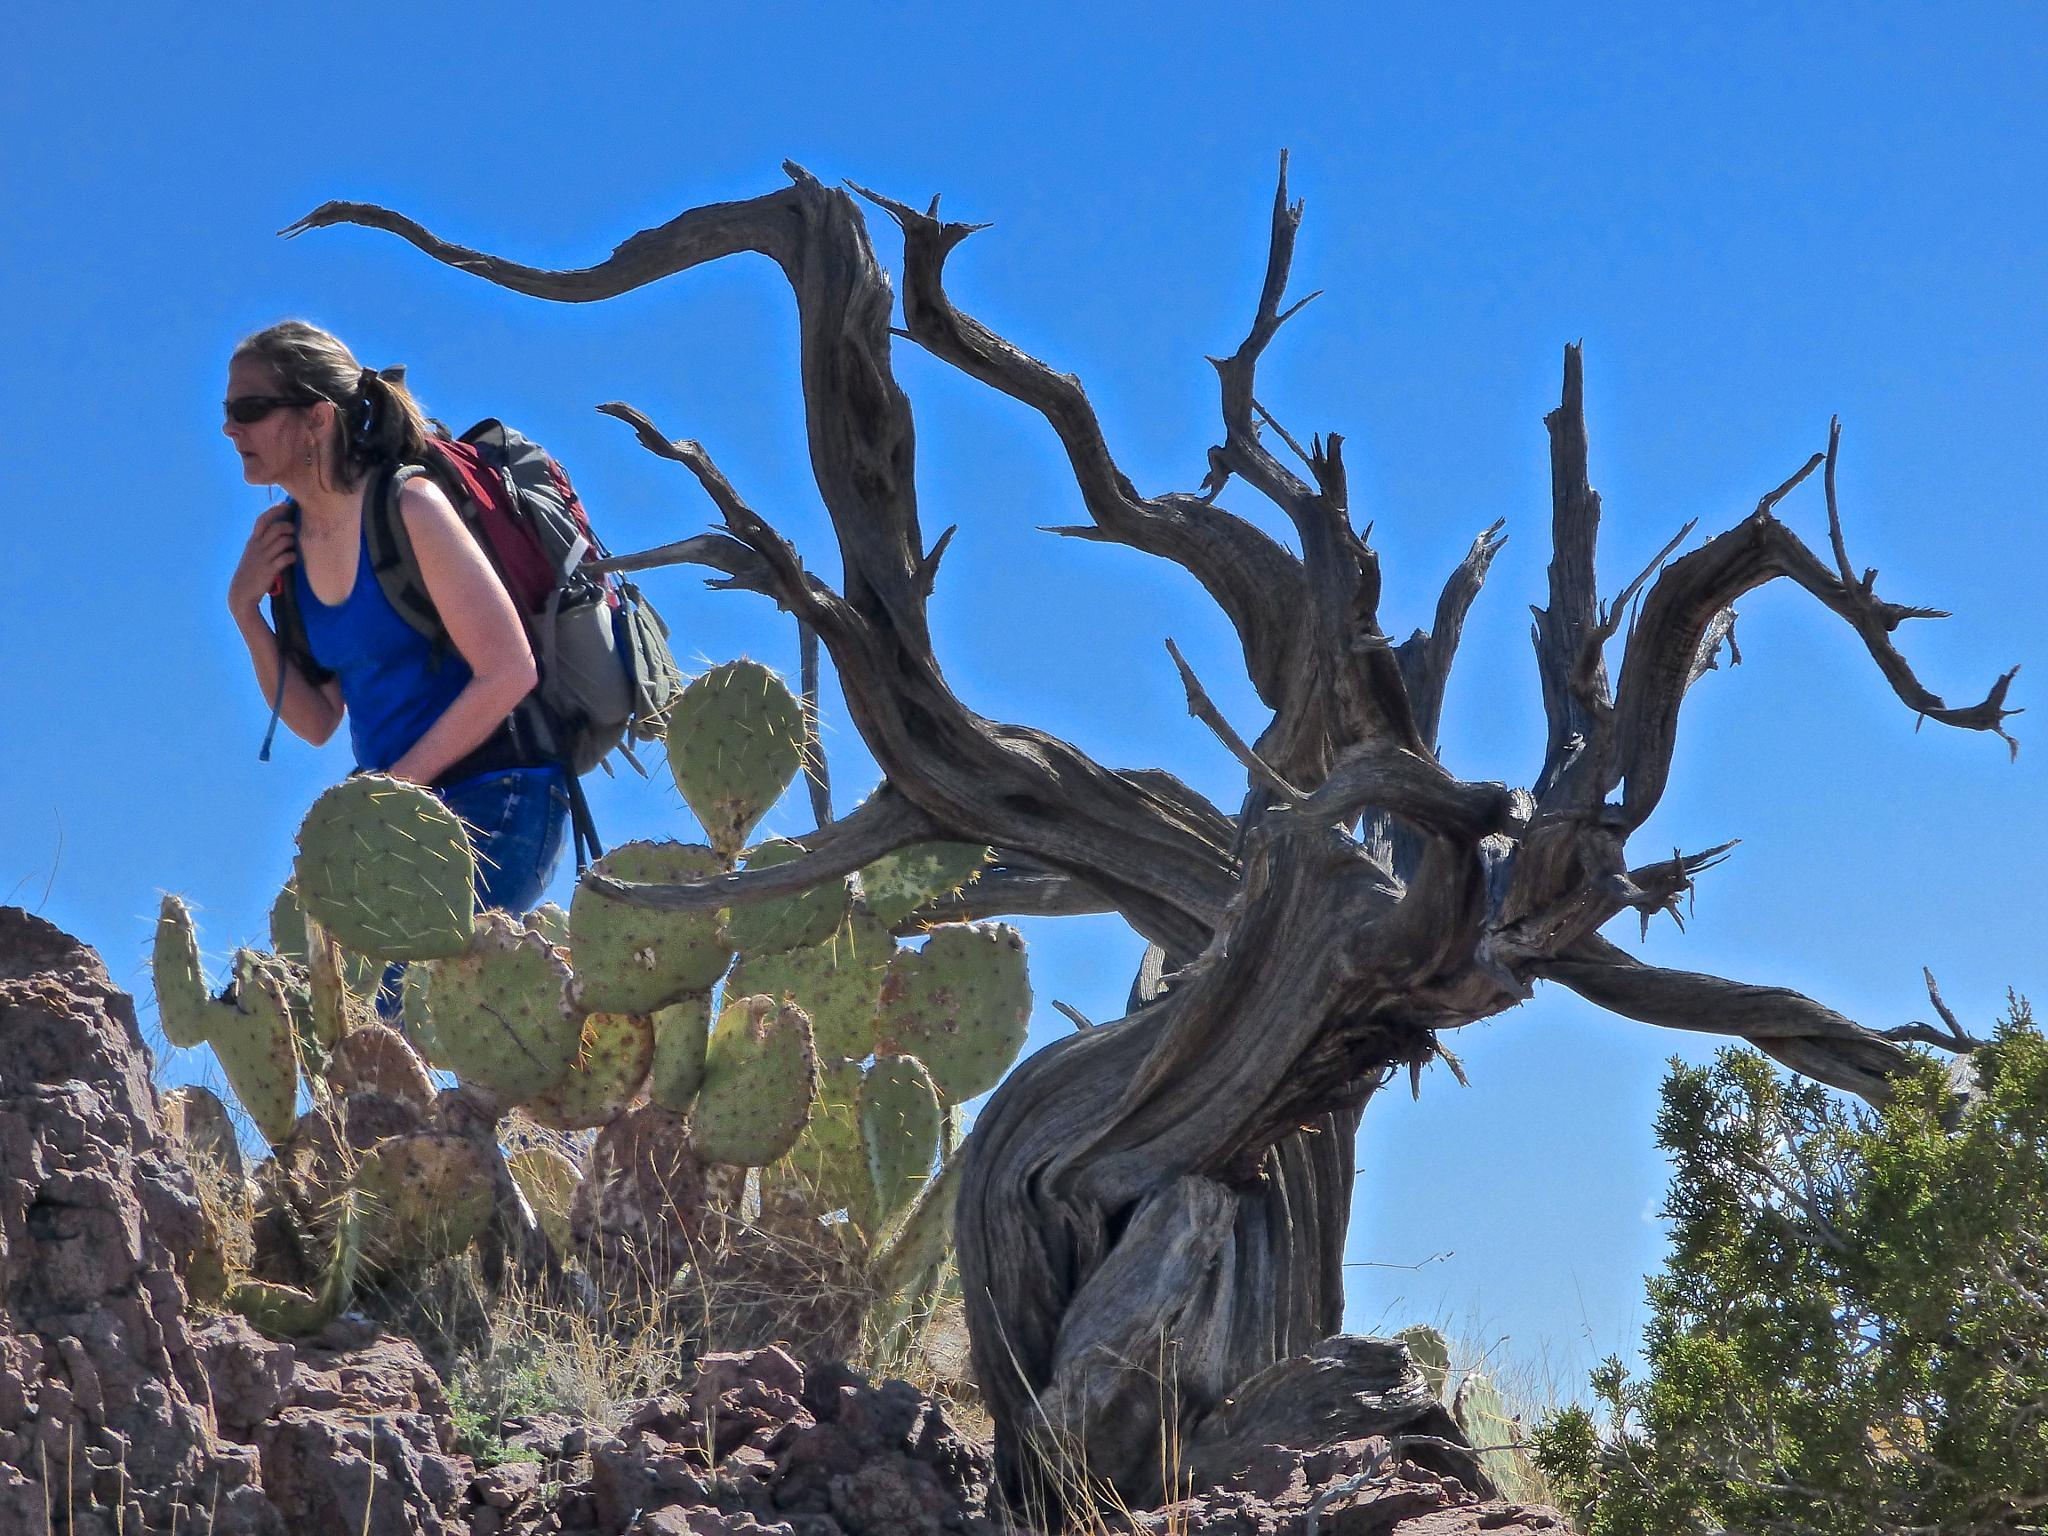 Hiking on a desert mountain by Hunter Ten Broeck